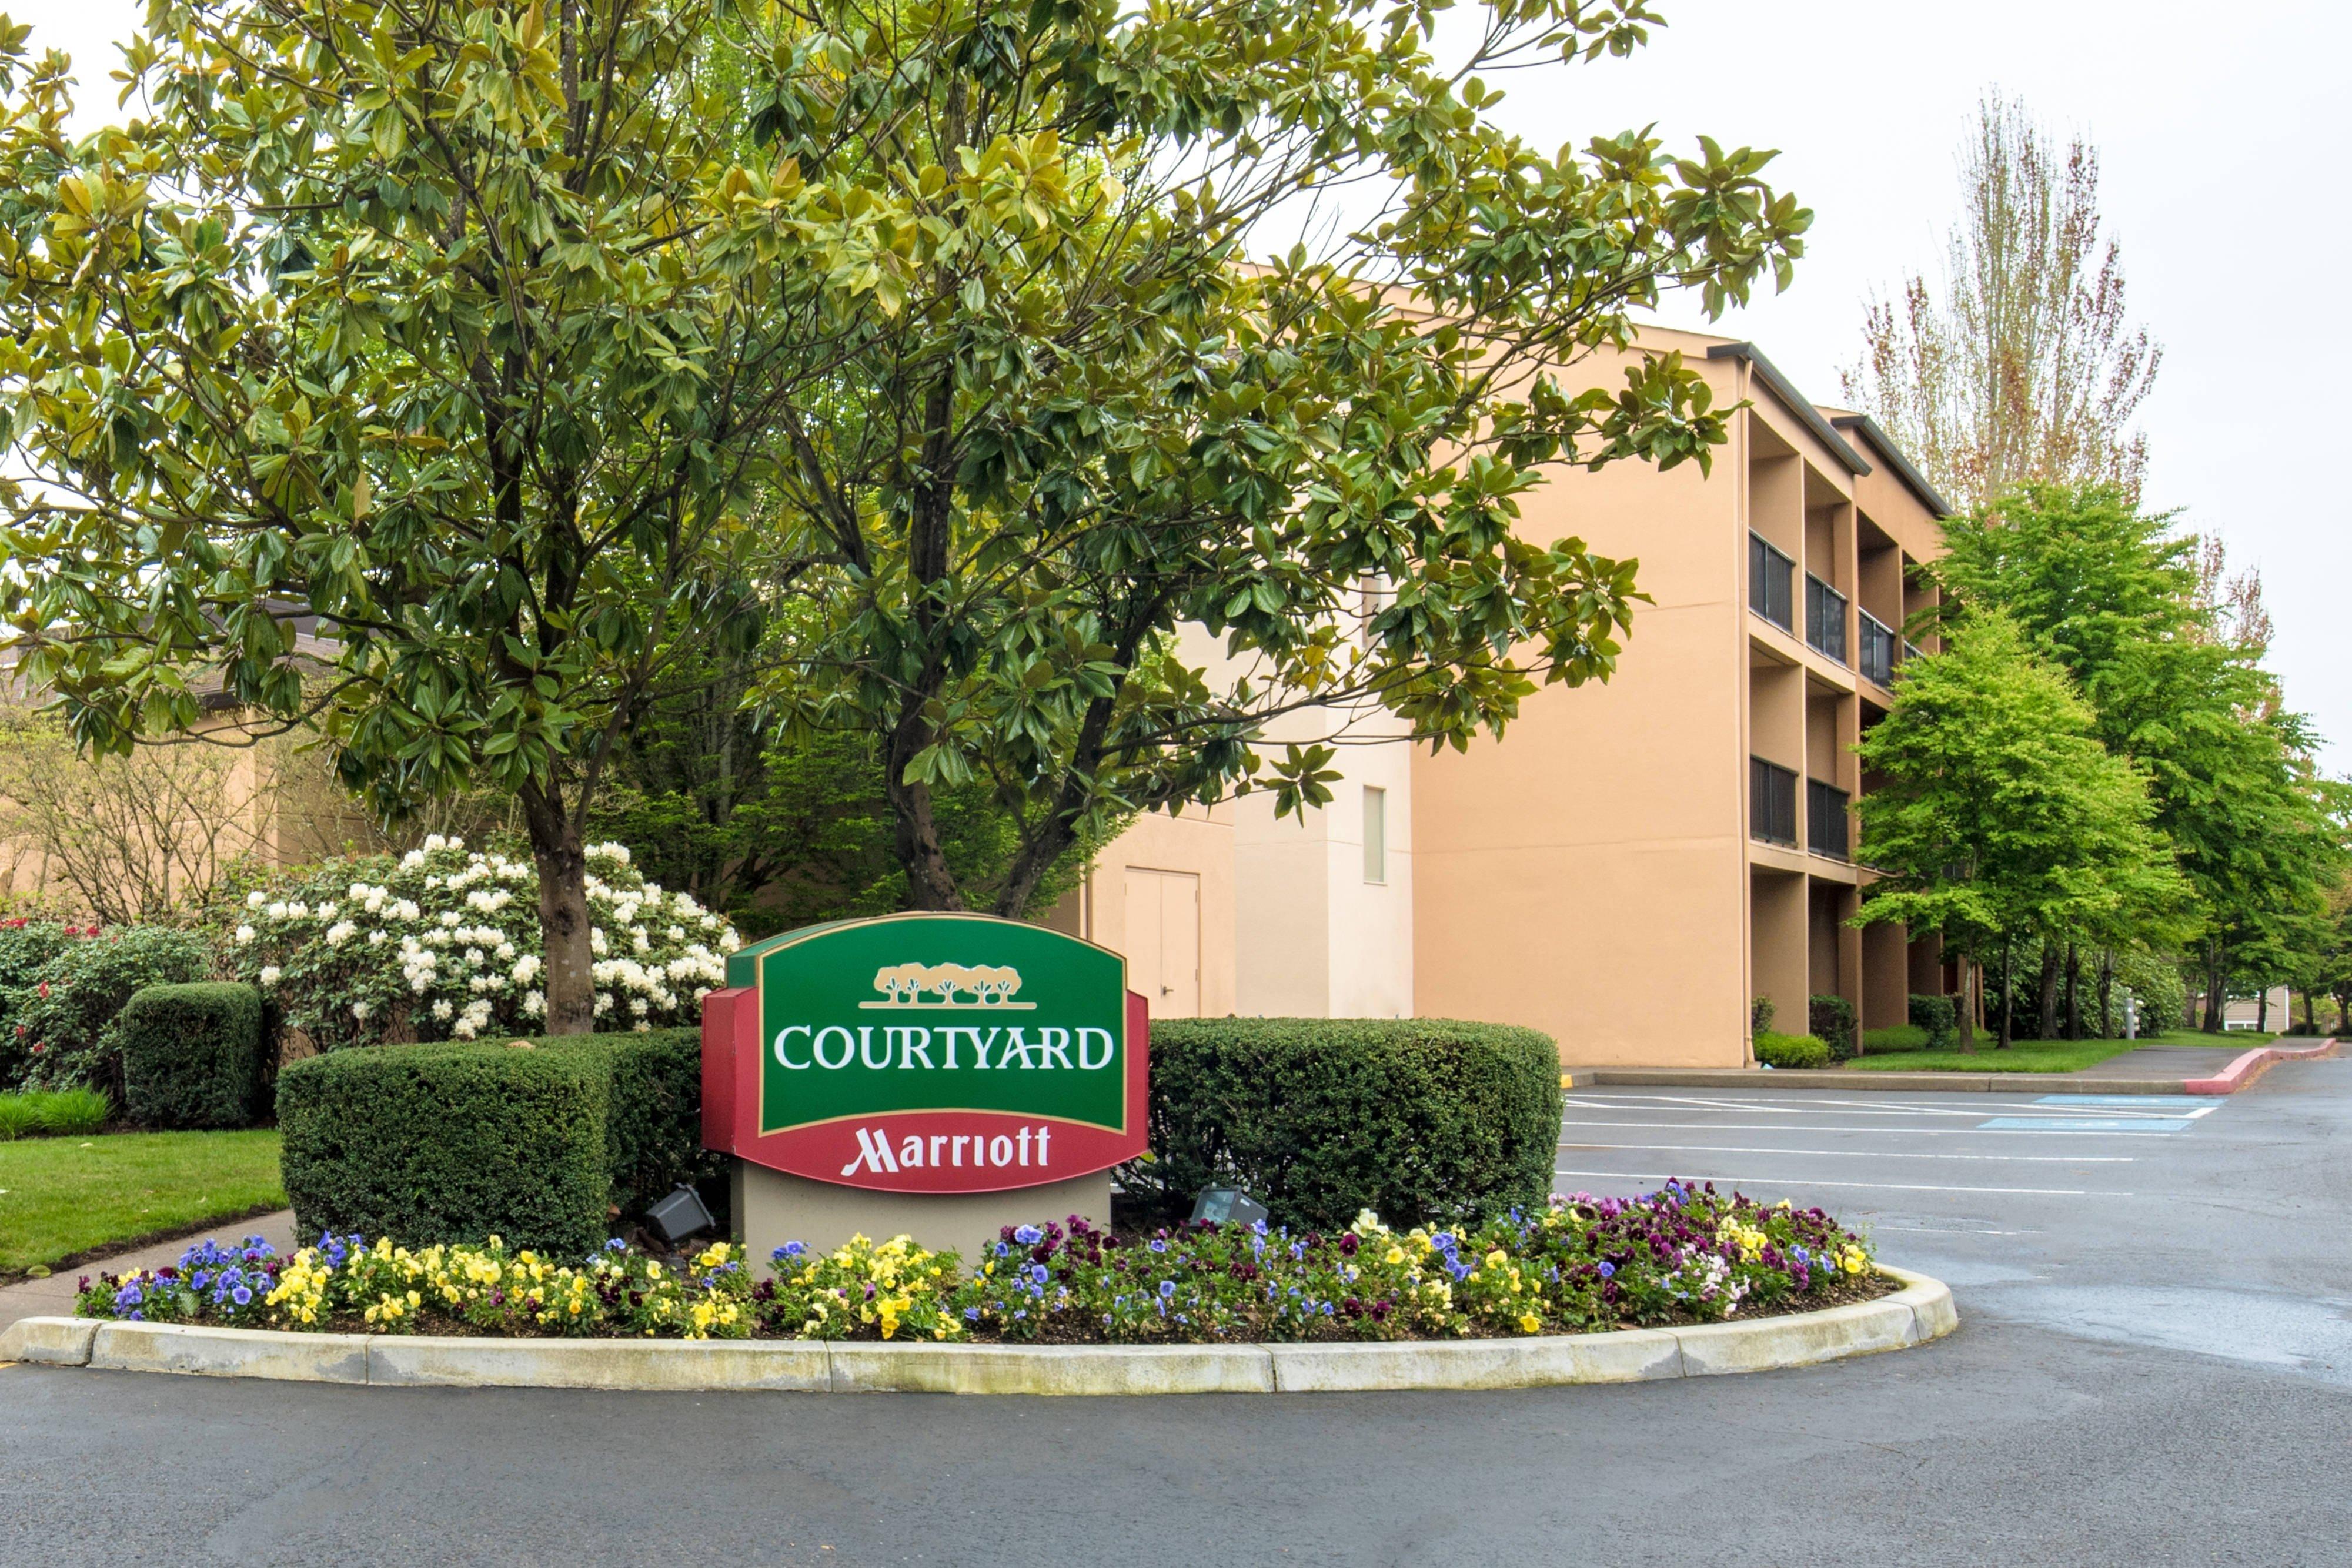 Courtyard Marriott Hillsboro